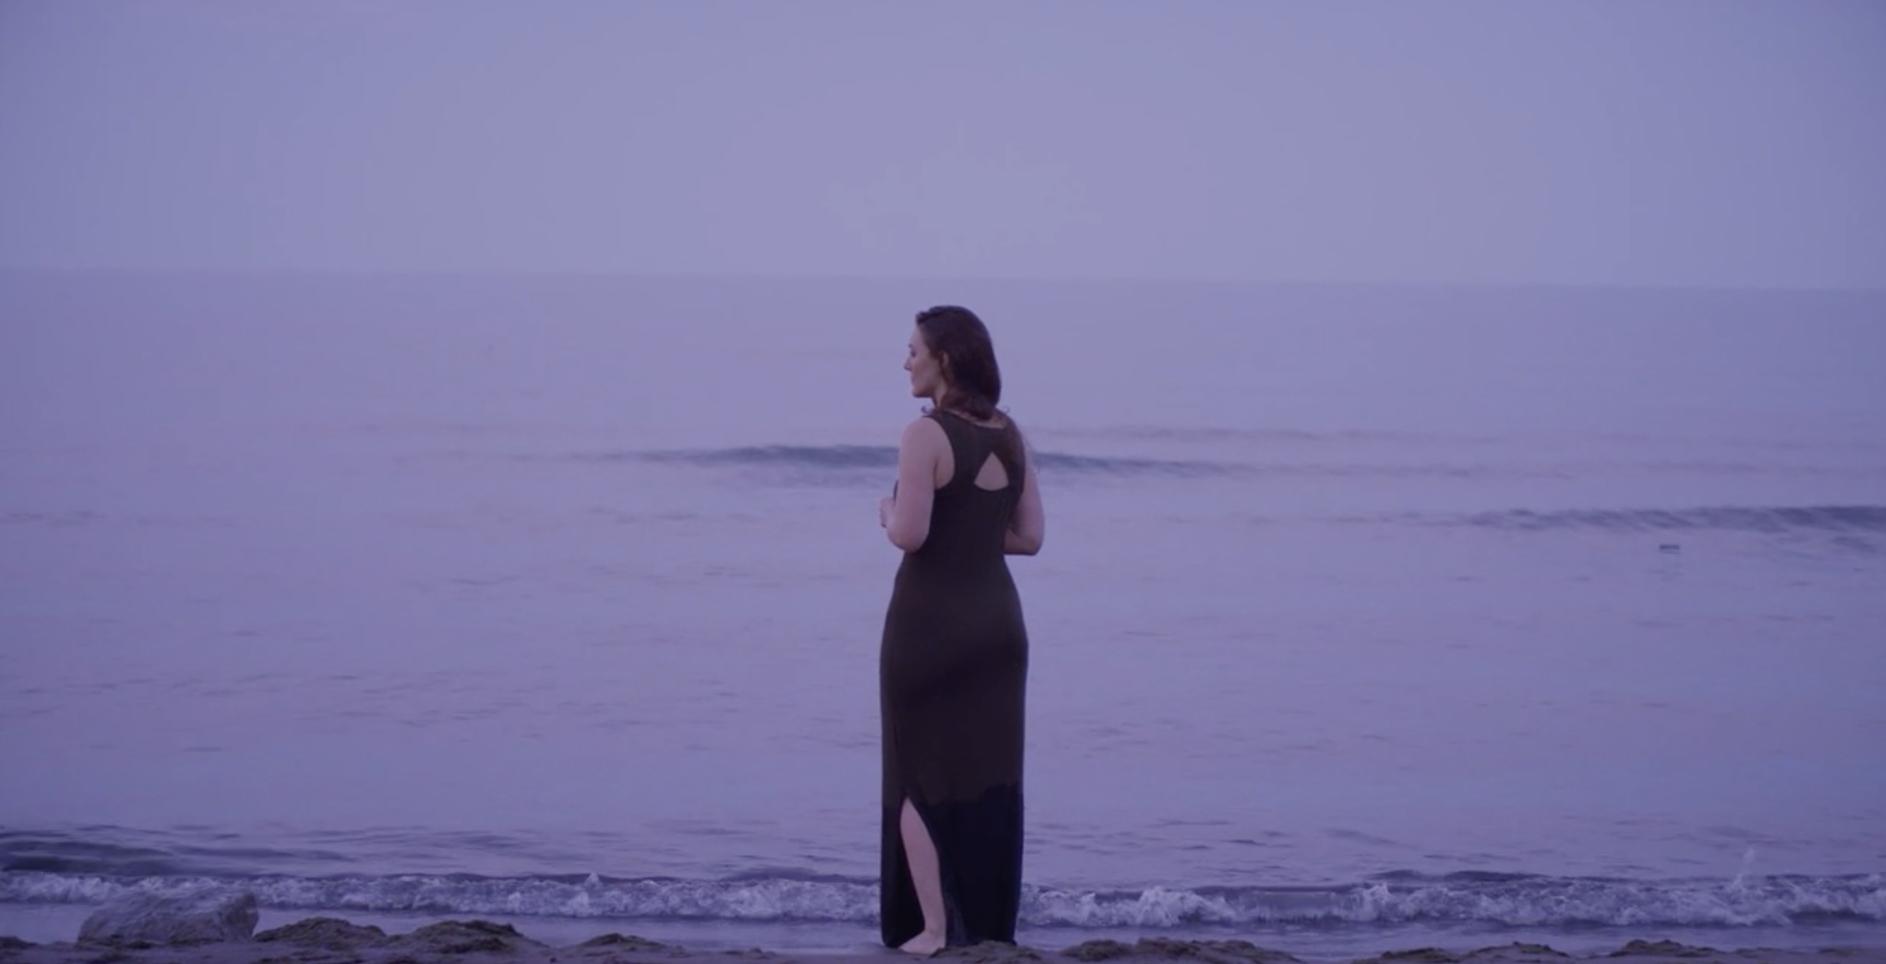 Nalip Member Sandra Avila To Produce Next Film: 19 DANIEL HIGHWAY & Nickolas Duarte Has New Short Film